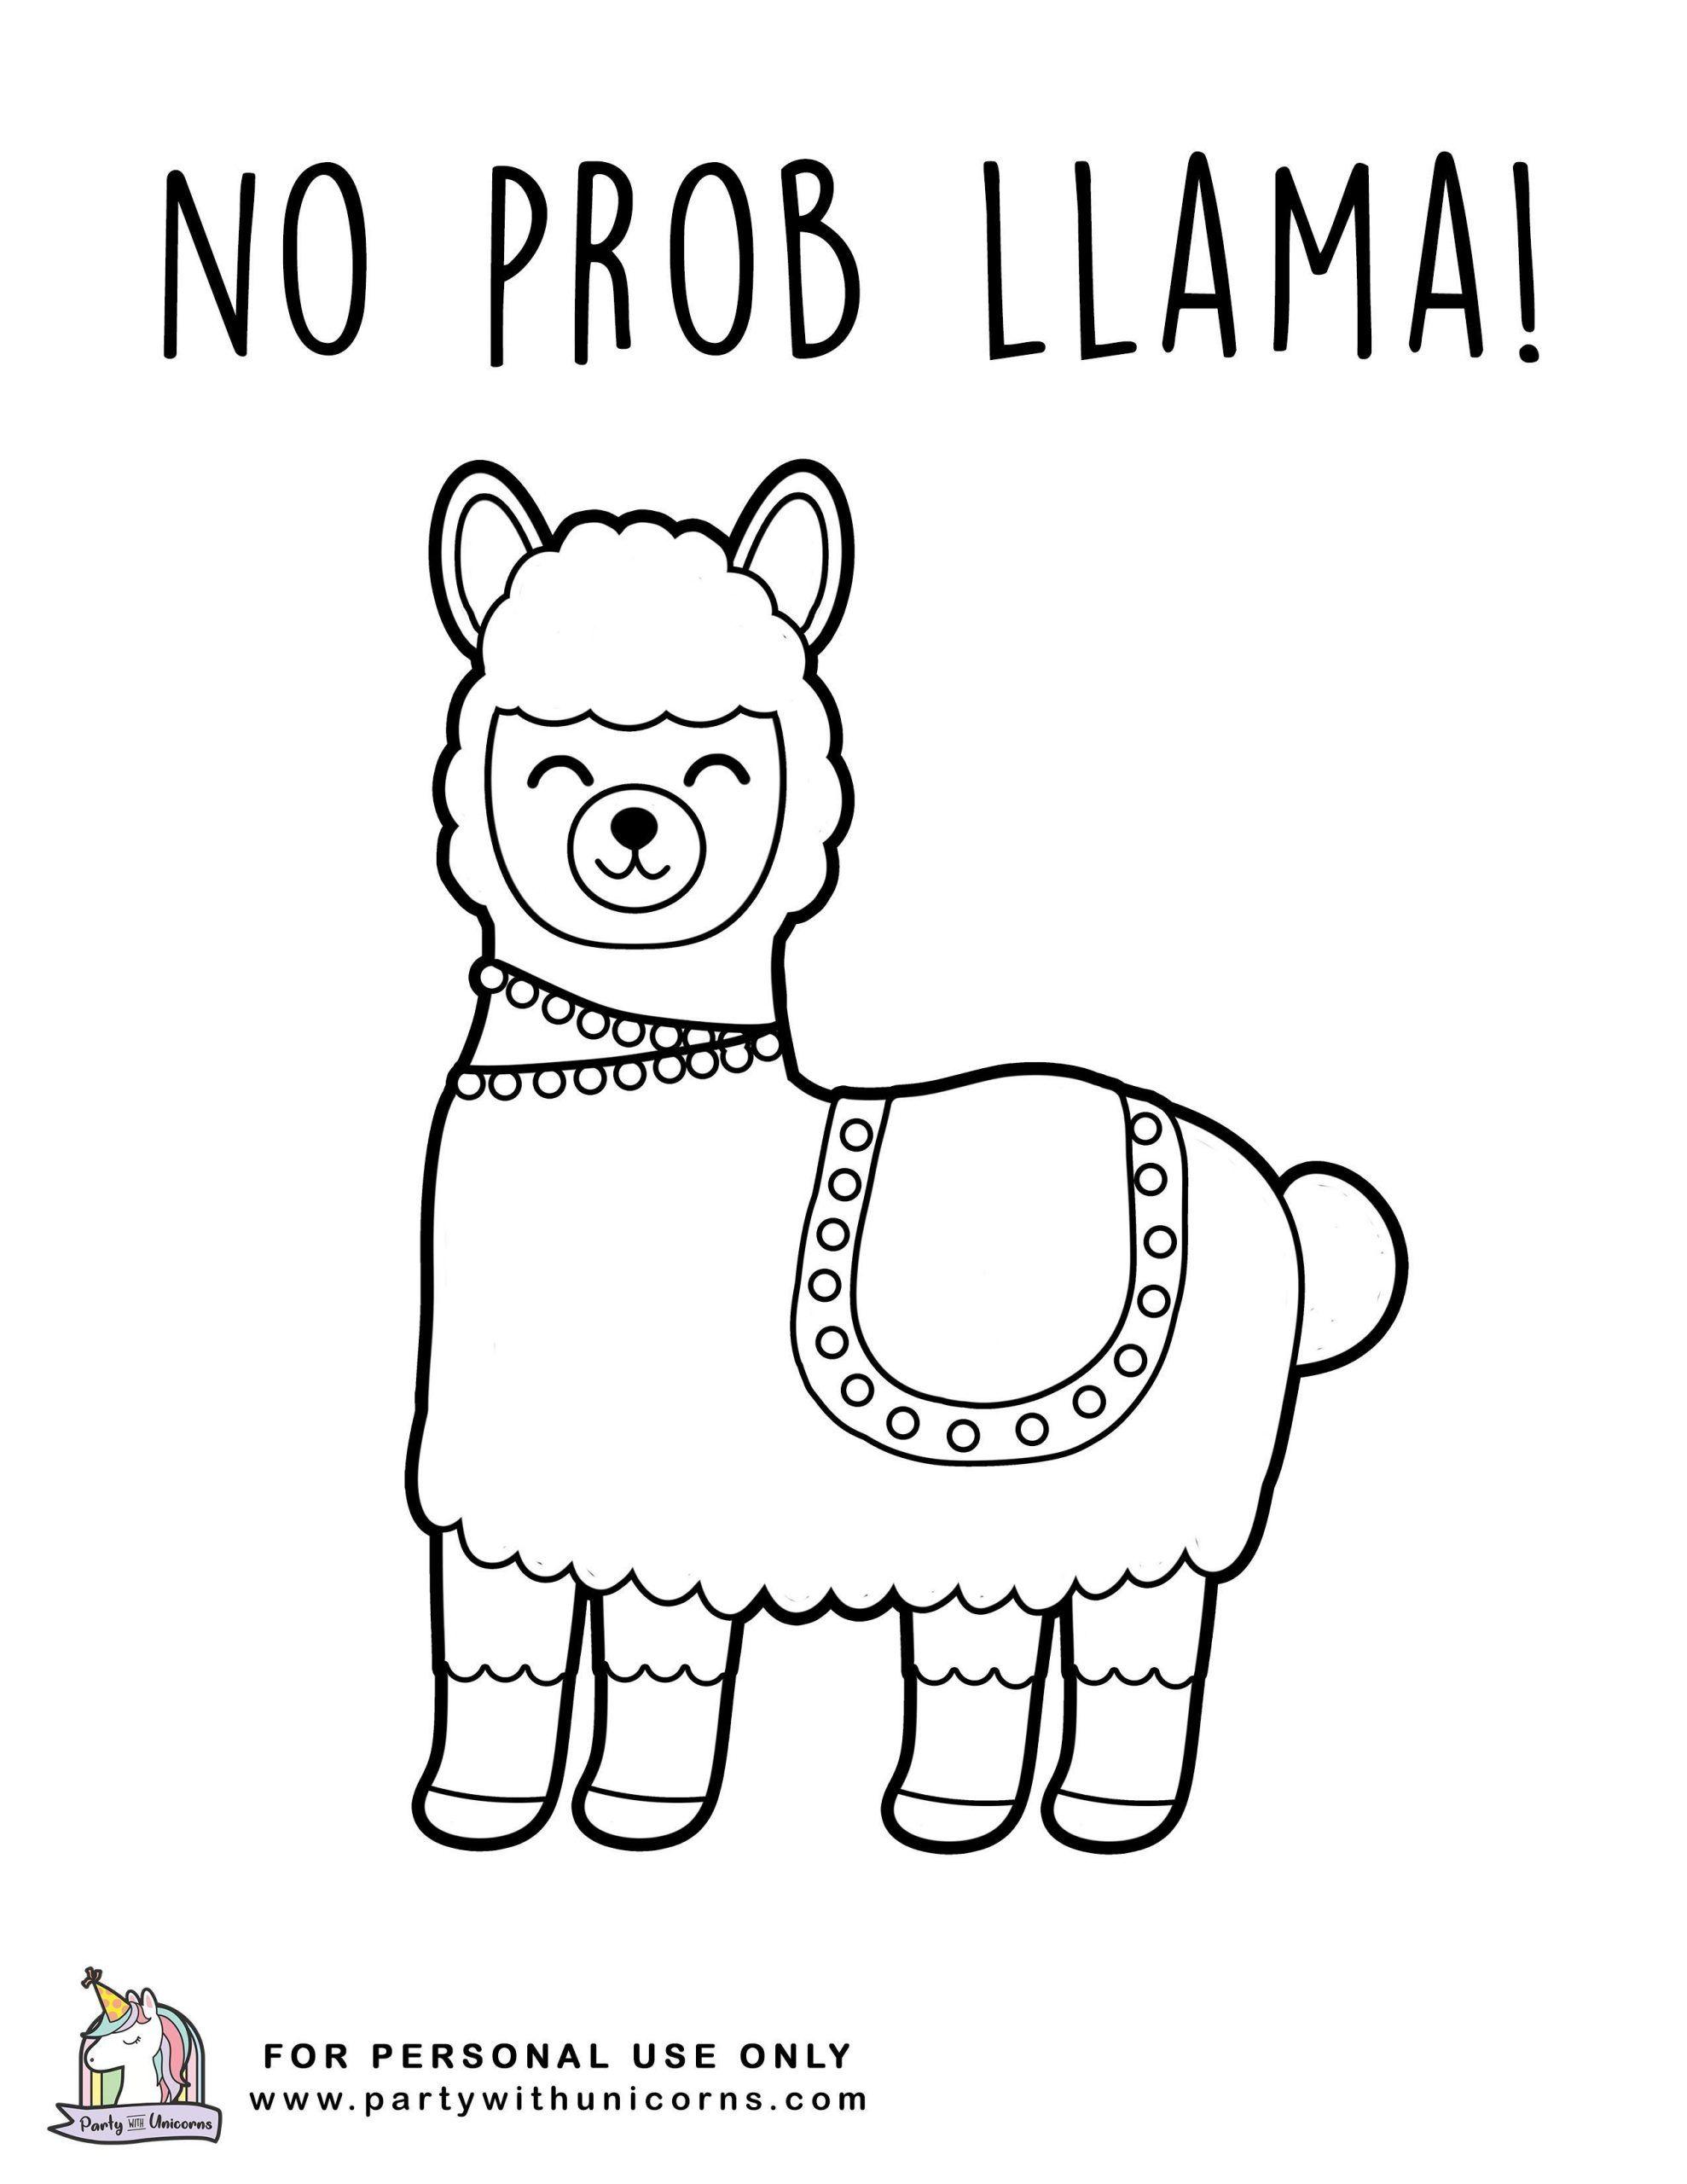 3 Llama Coloring Page Llama Coloring Pages In 2020 Coloring Pages Coloring Pages For Kids Coloring Books